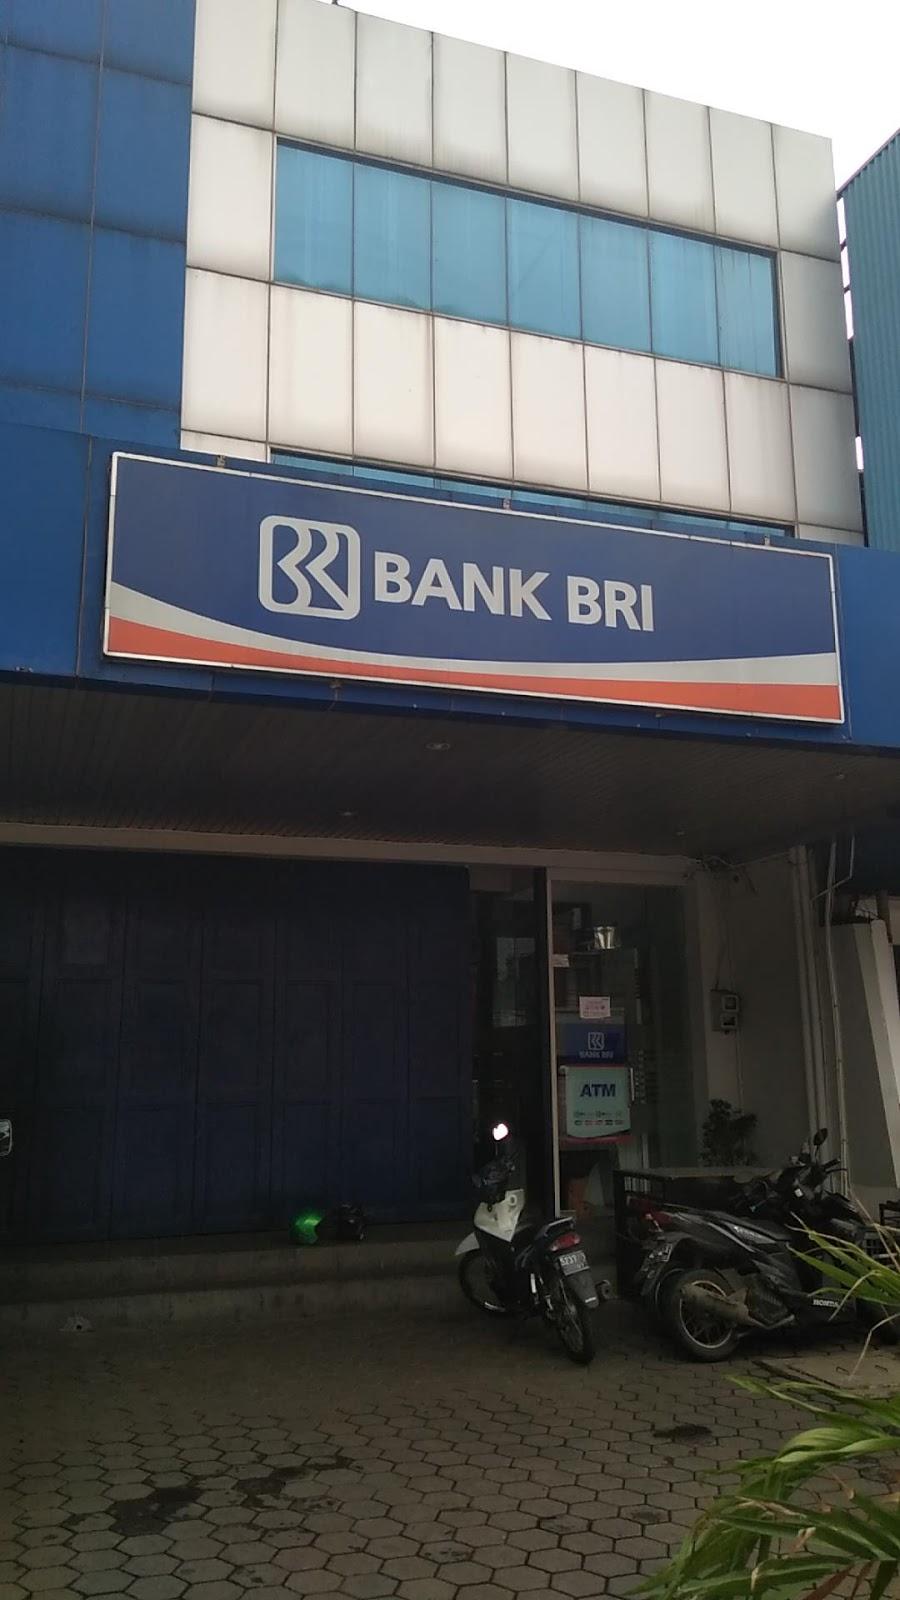 Bank Bri Jl Buah Batu No 162 Turangga Lengkong Bandung Jawa Zachodnia 40264 Indonezja